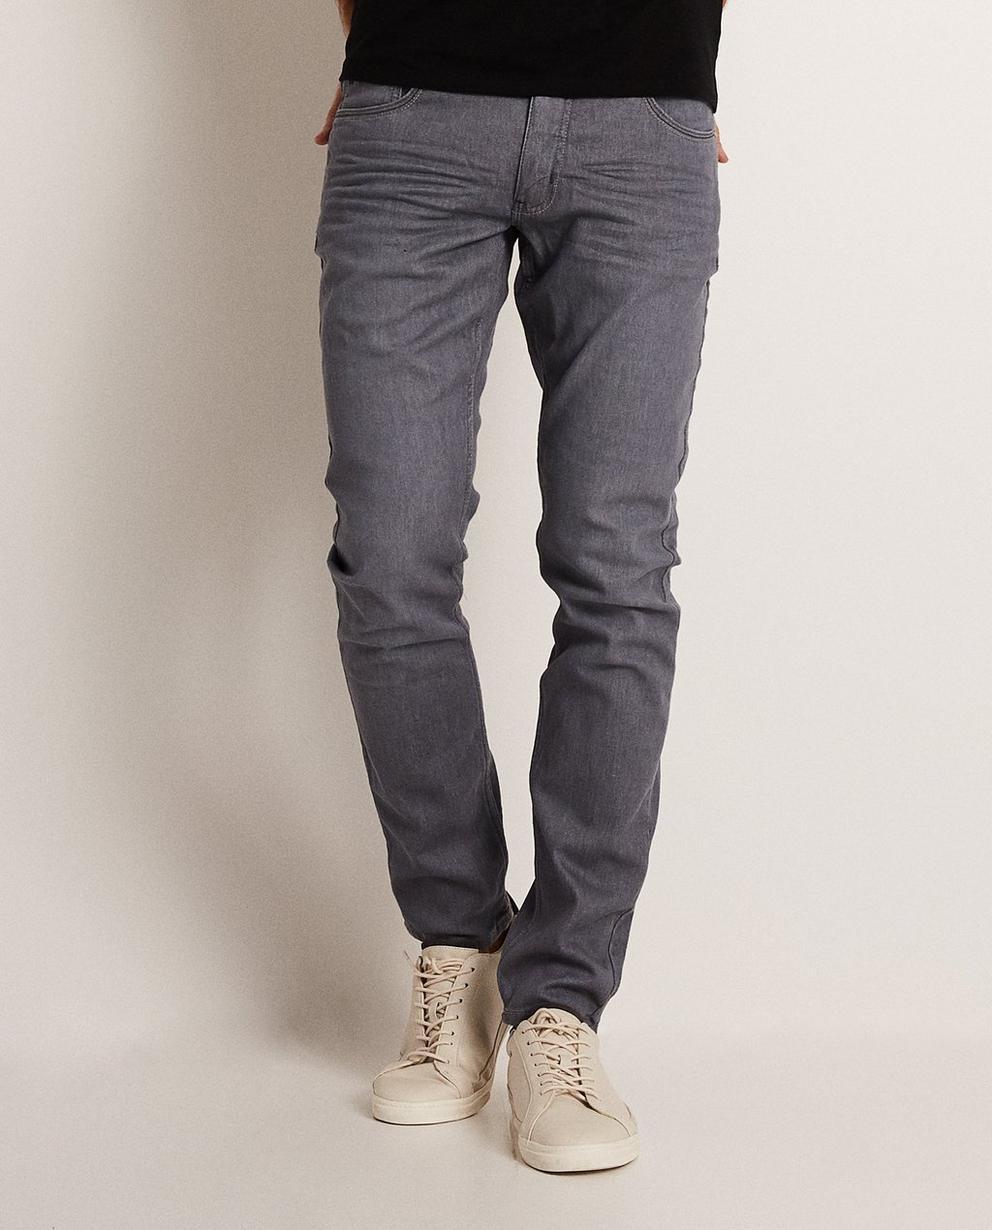 Jeans - grey - Jeans skinny JIMMY